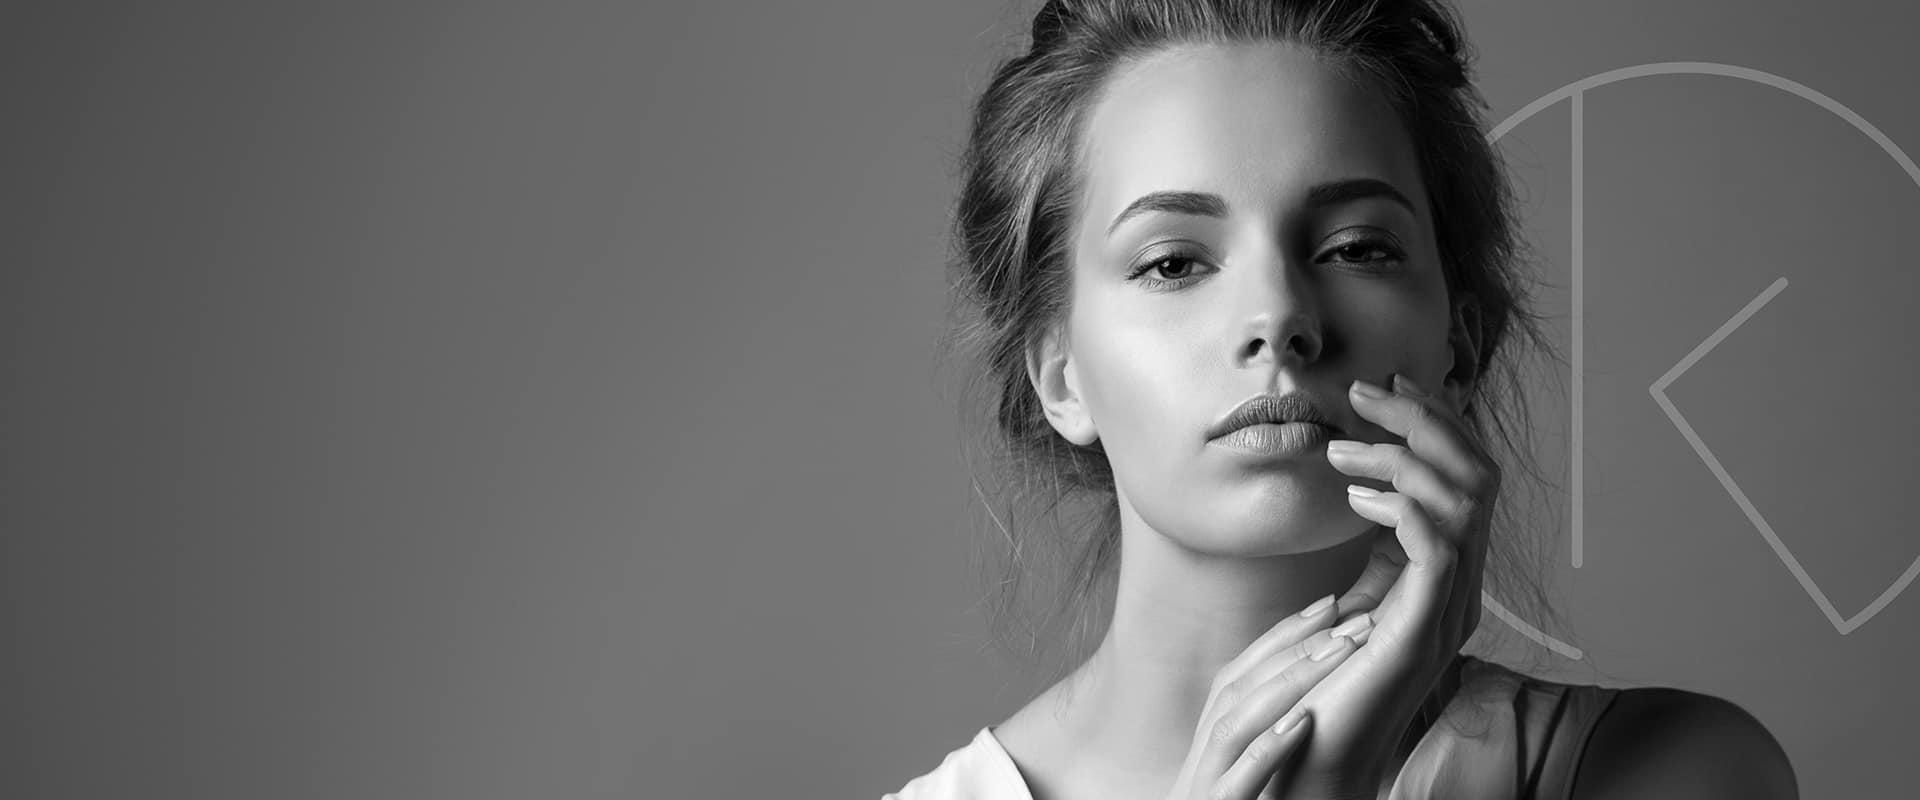 Schoonheidssalon Duiven Petra Barthen Professional Skincare & IK Skin Perfection